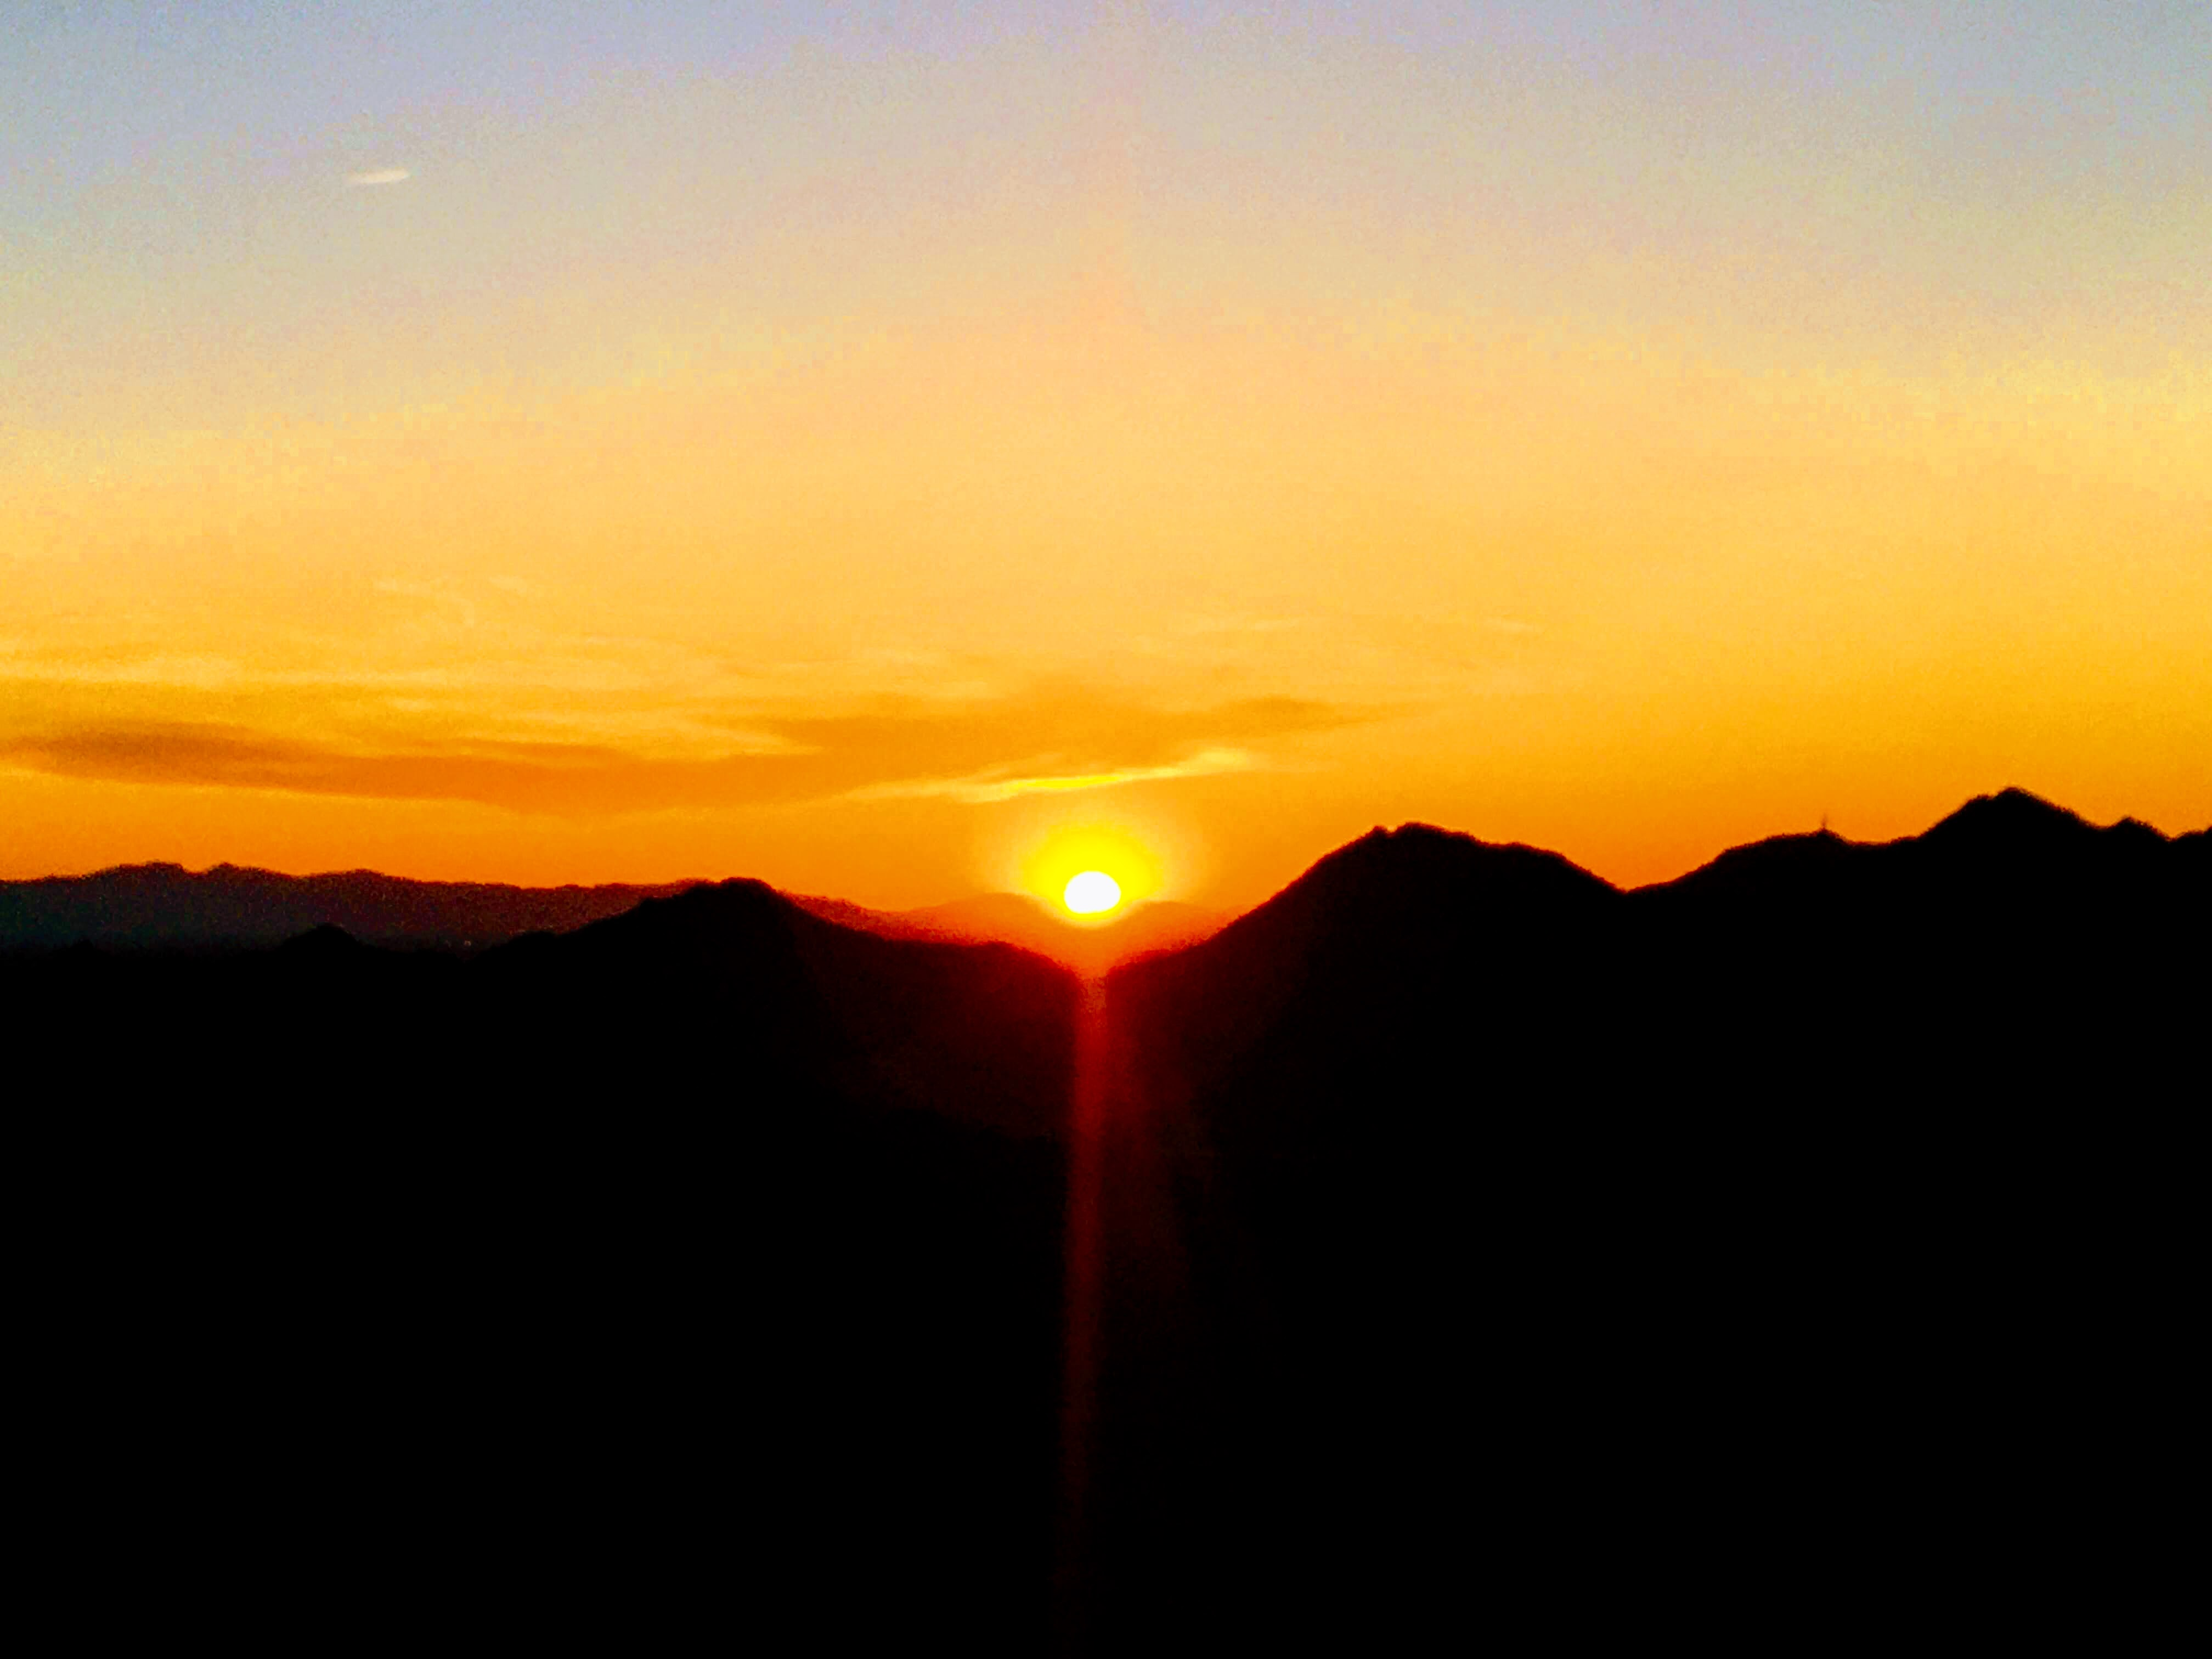 Arizona sunset viewed from Phoenix Mountains Preserve